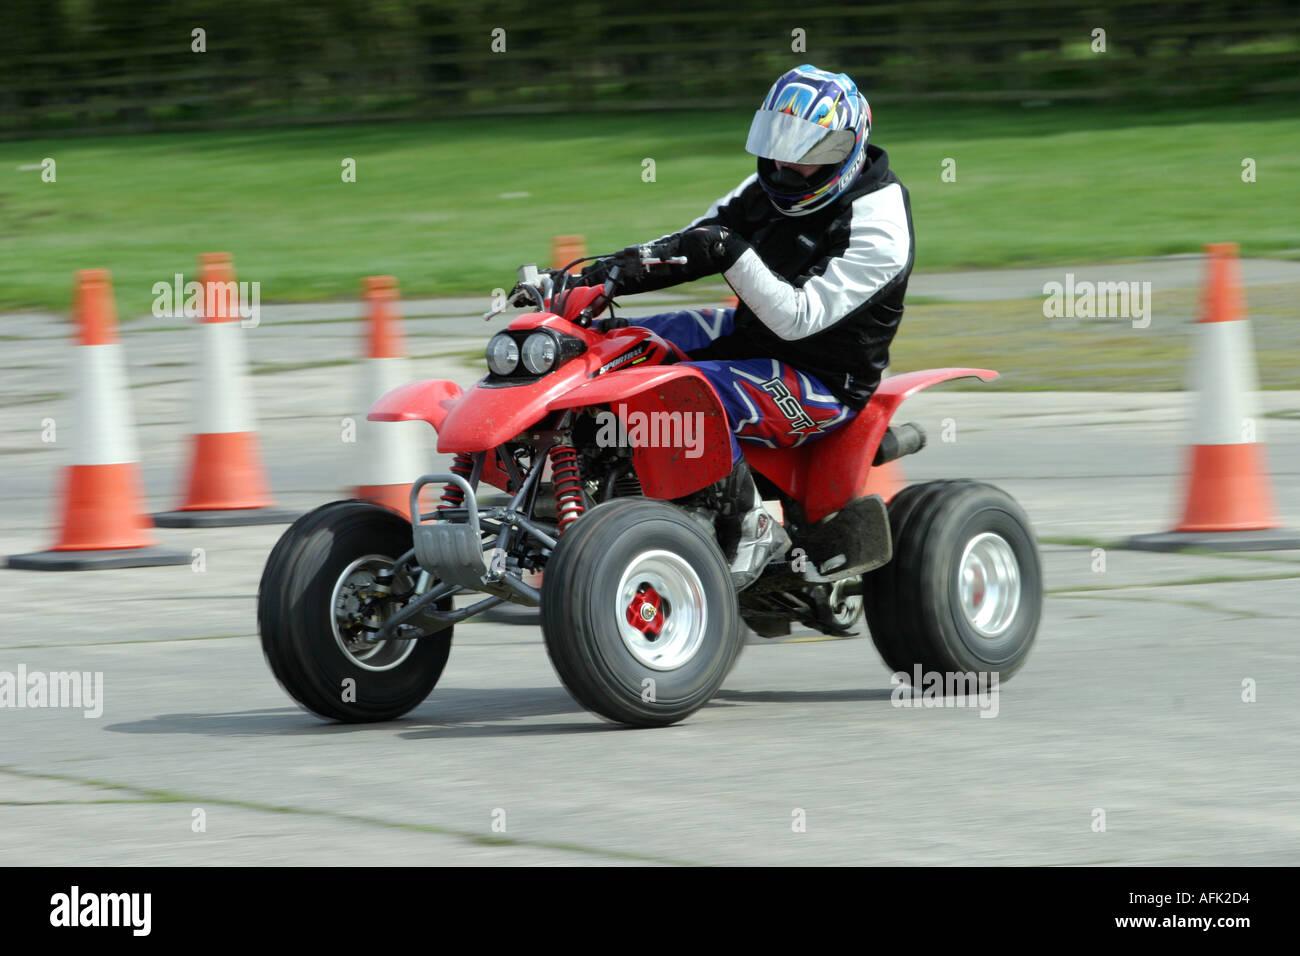 Stuntman on a quadbike - Stock Image